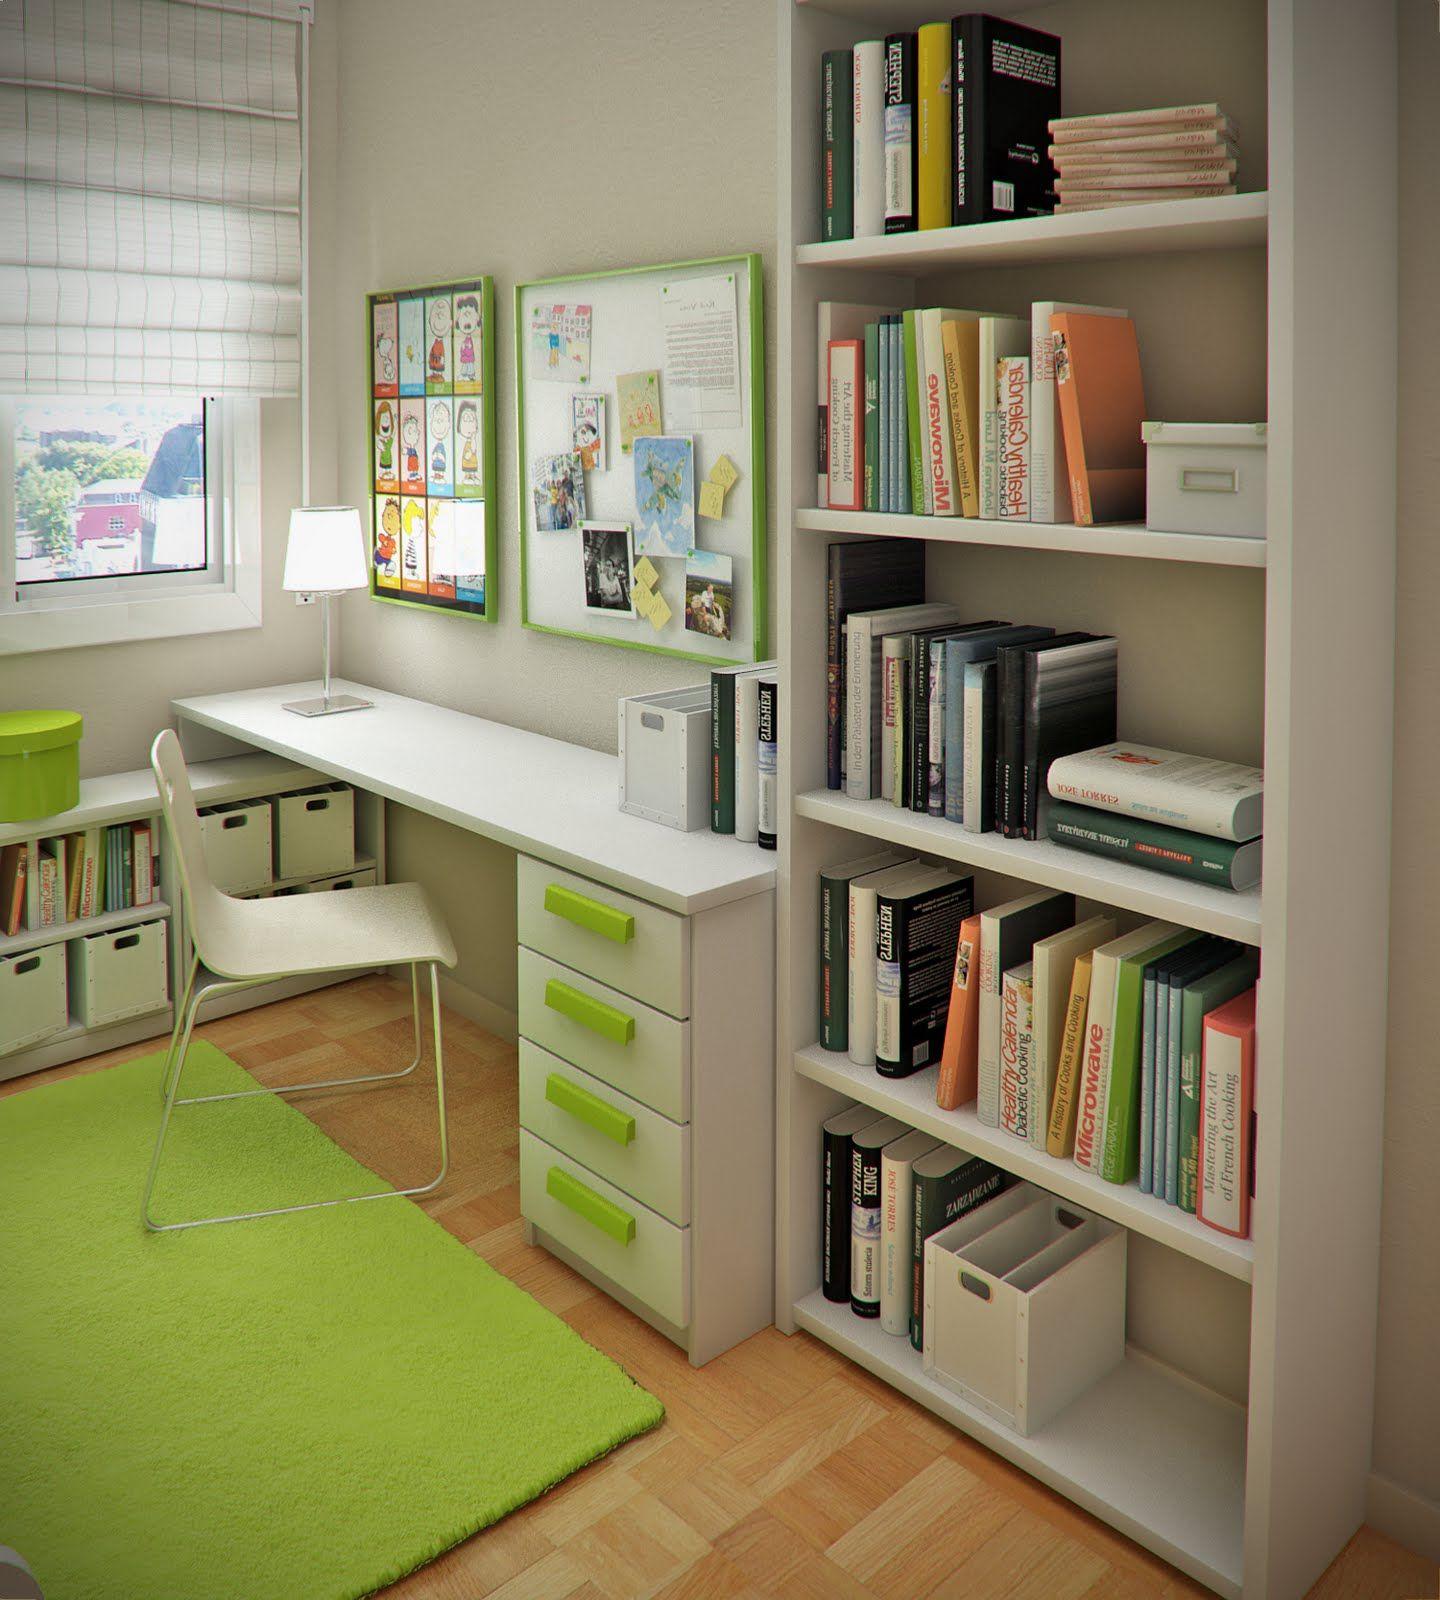 Small Floorspace Kids Rooms Kids Interior Room Small Room Design Small Bedroom Desk